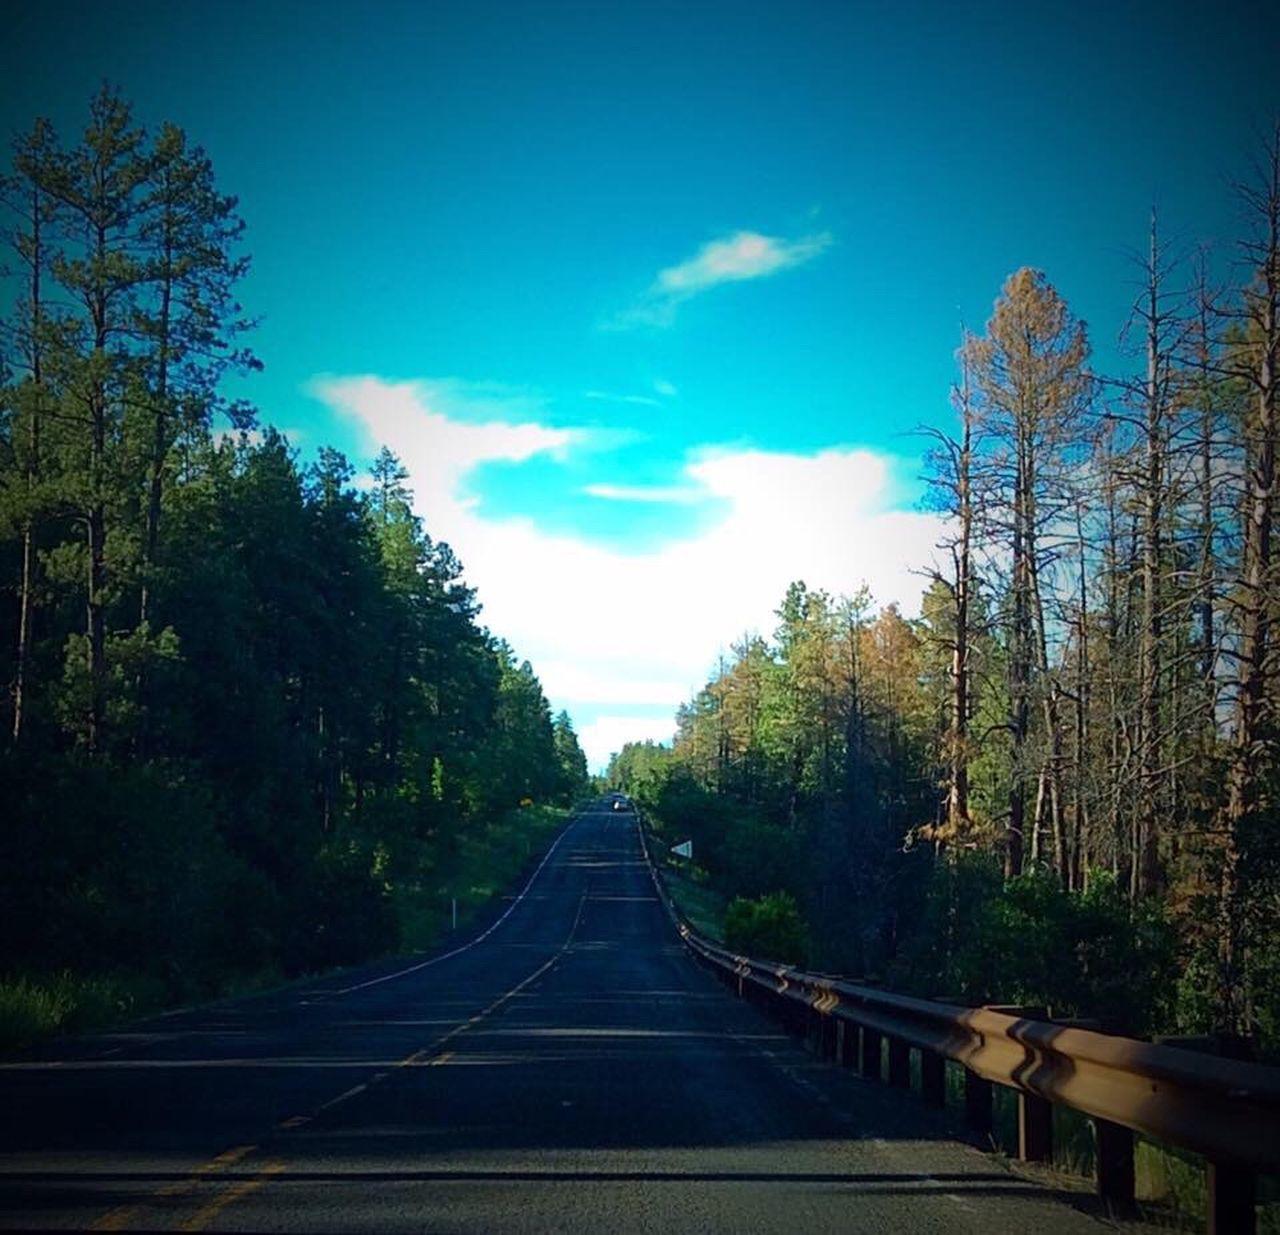 Arizona Sedona Oak Creek Canyon Flagstaff Life Is A Highway All Paths Lead To Somewhere Road Trip Travels Trees Roadway Greenery Scenic Shrubery Roadside